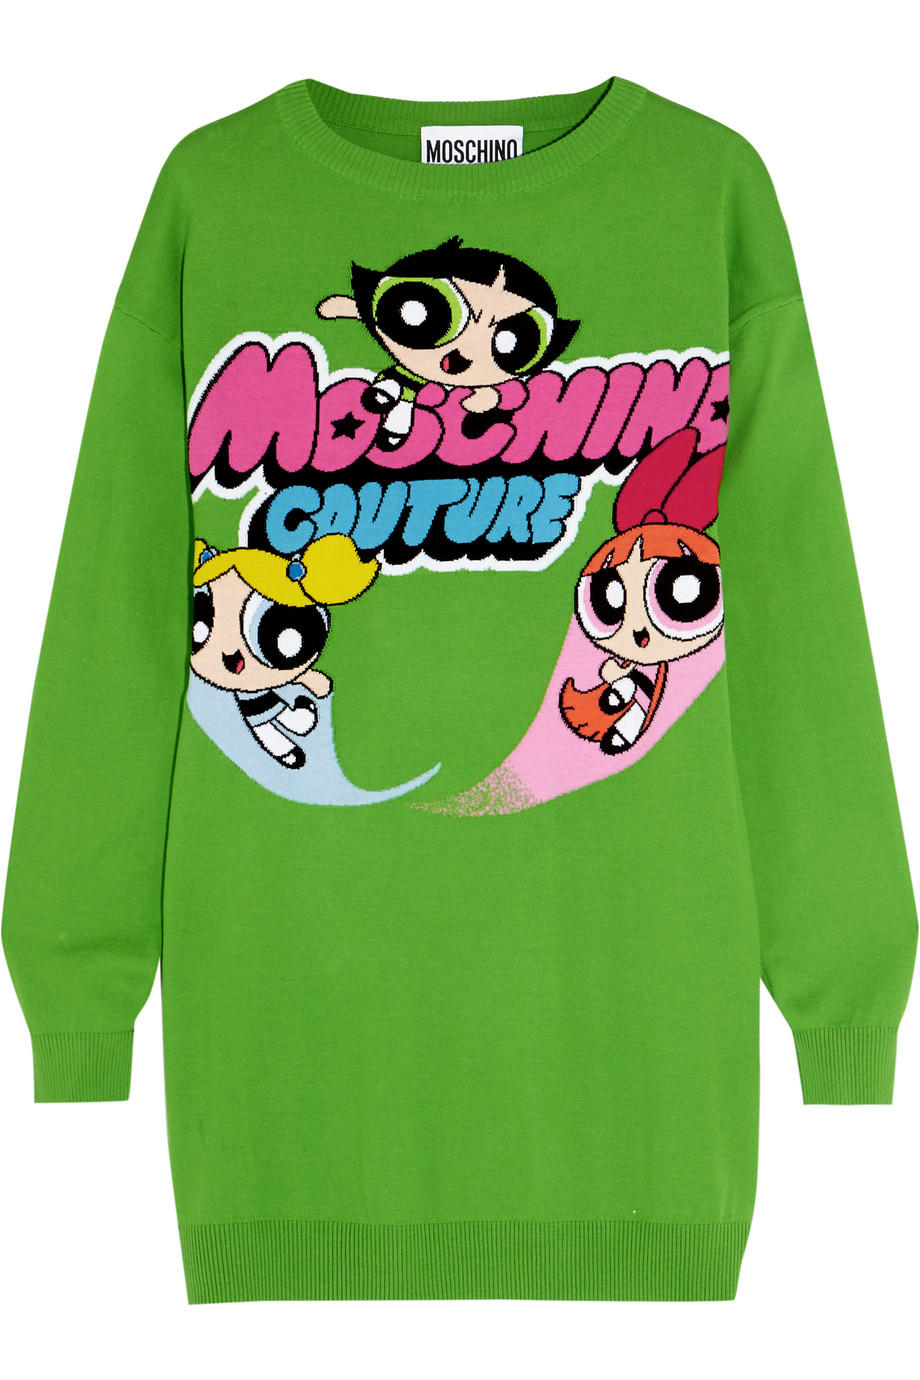 Moschino Intarsia Cotton Sweater Dress, Green, Women's, Size: XL